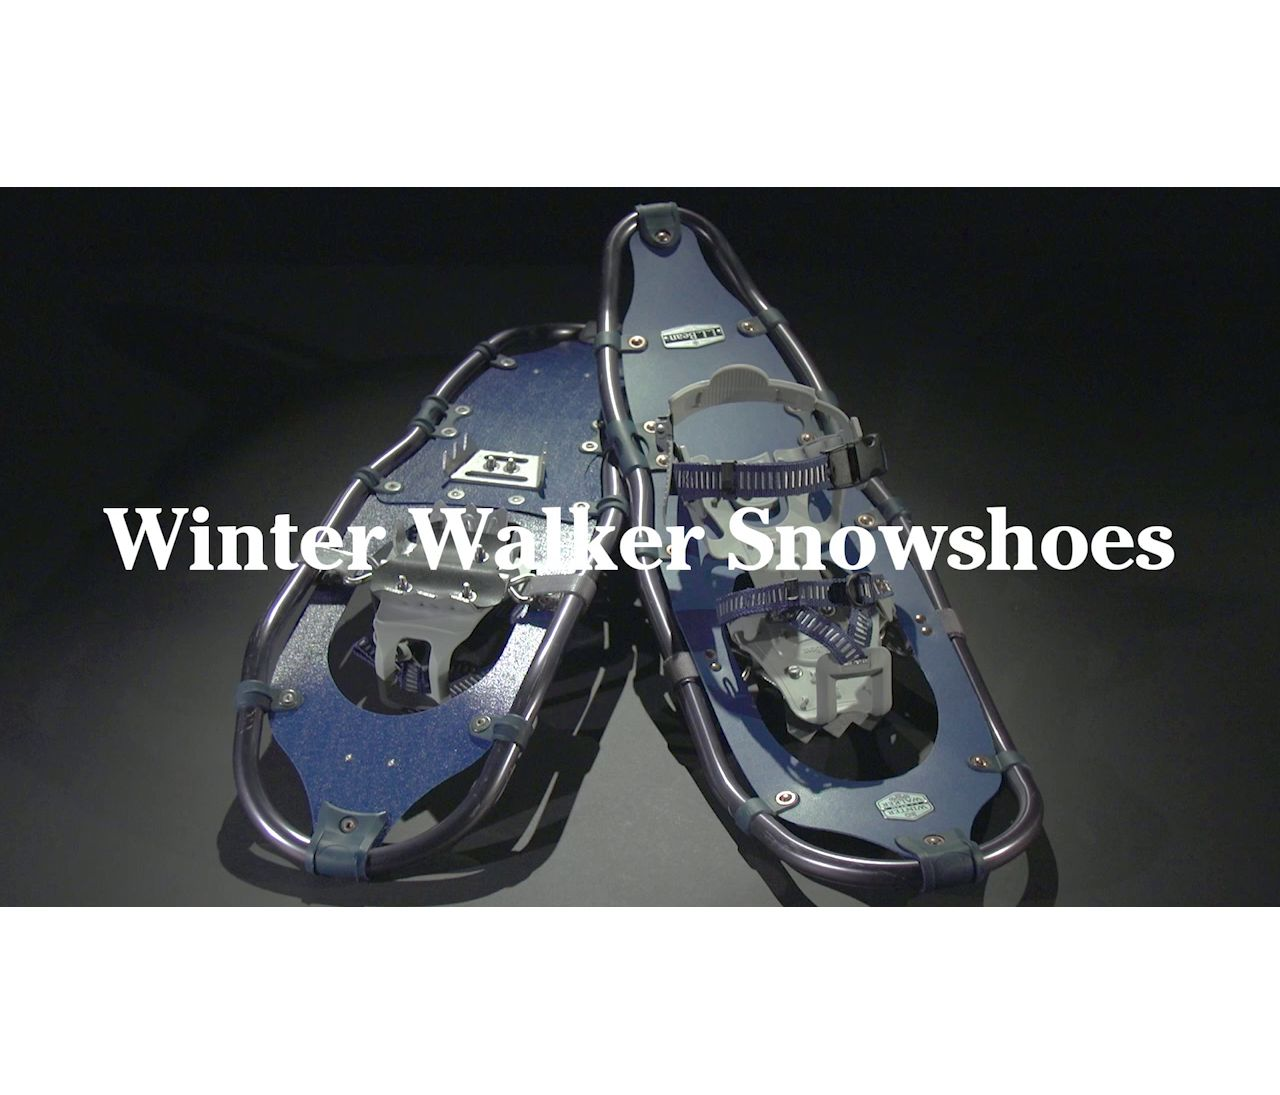 Video: Winter Walker Snowshoe Boxed Sets